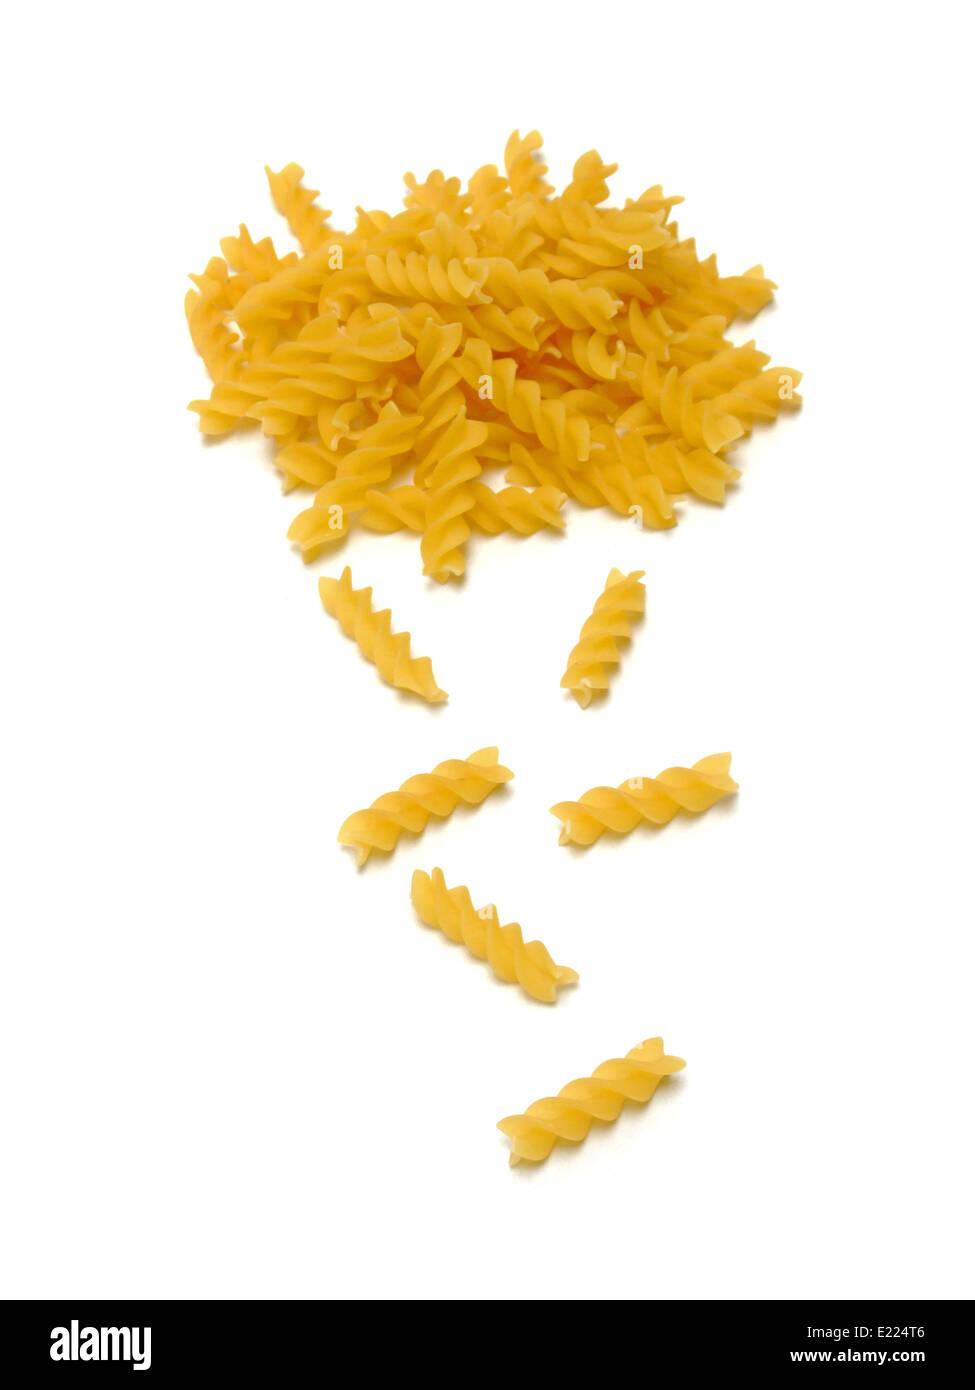 noodles - Stock Image